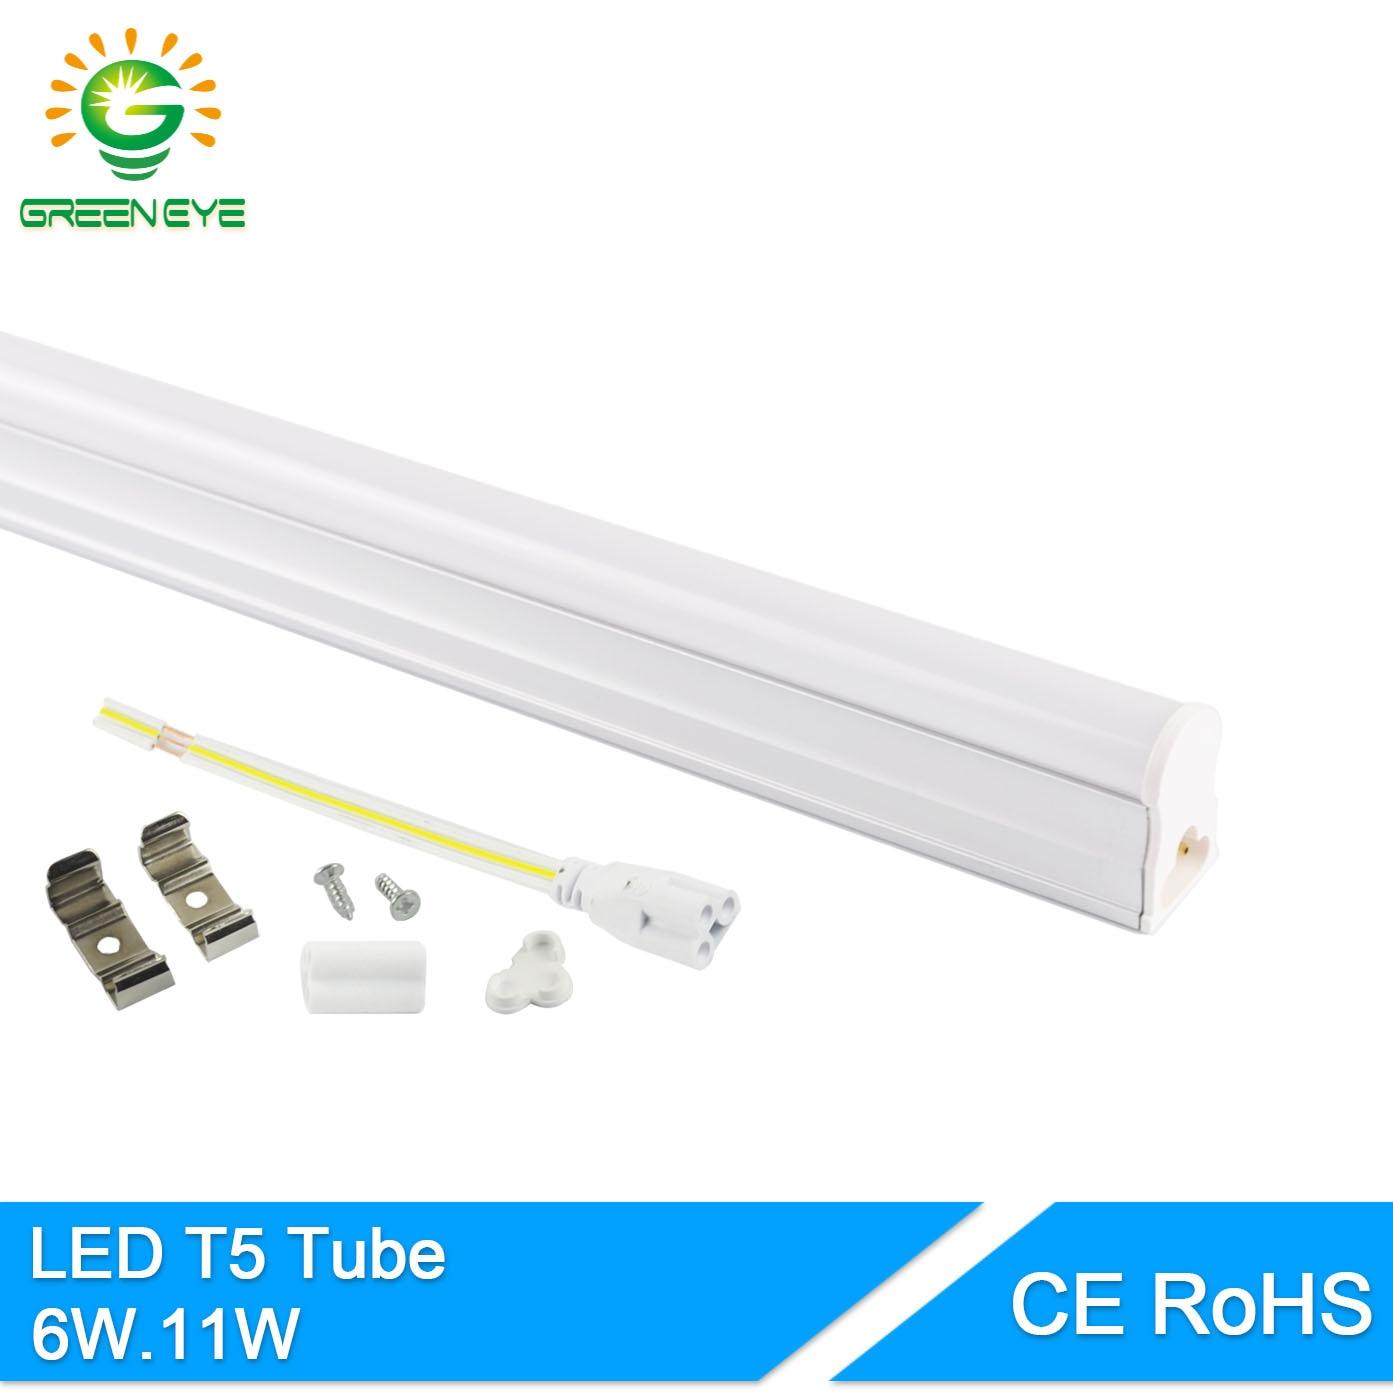 GreenEye-font-b-11W-b-font-6W-LED-T5-Tube-Light-220V-60cm-30cm-T5-lamp Fabelhafte Osram Dulux S 11w 827 Dekorationen